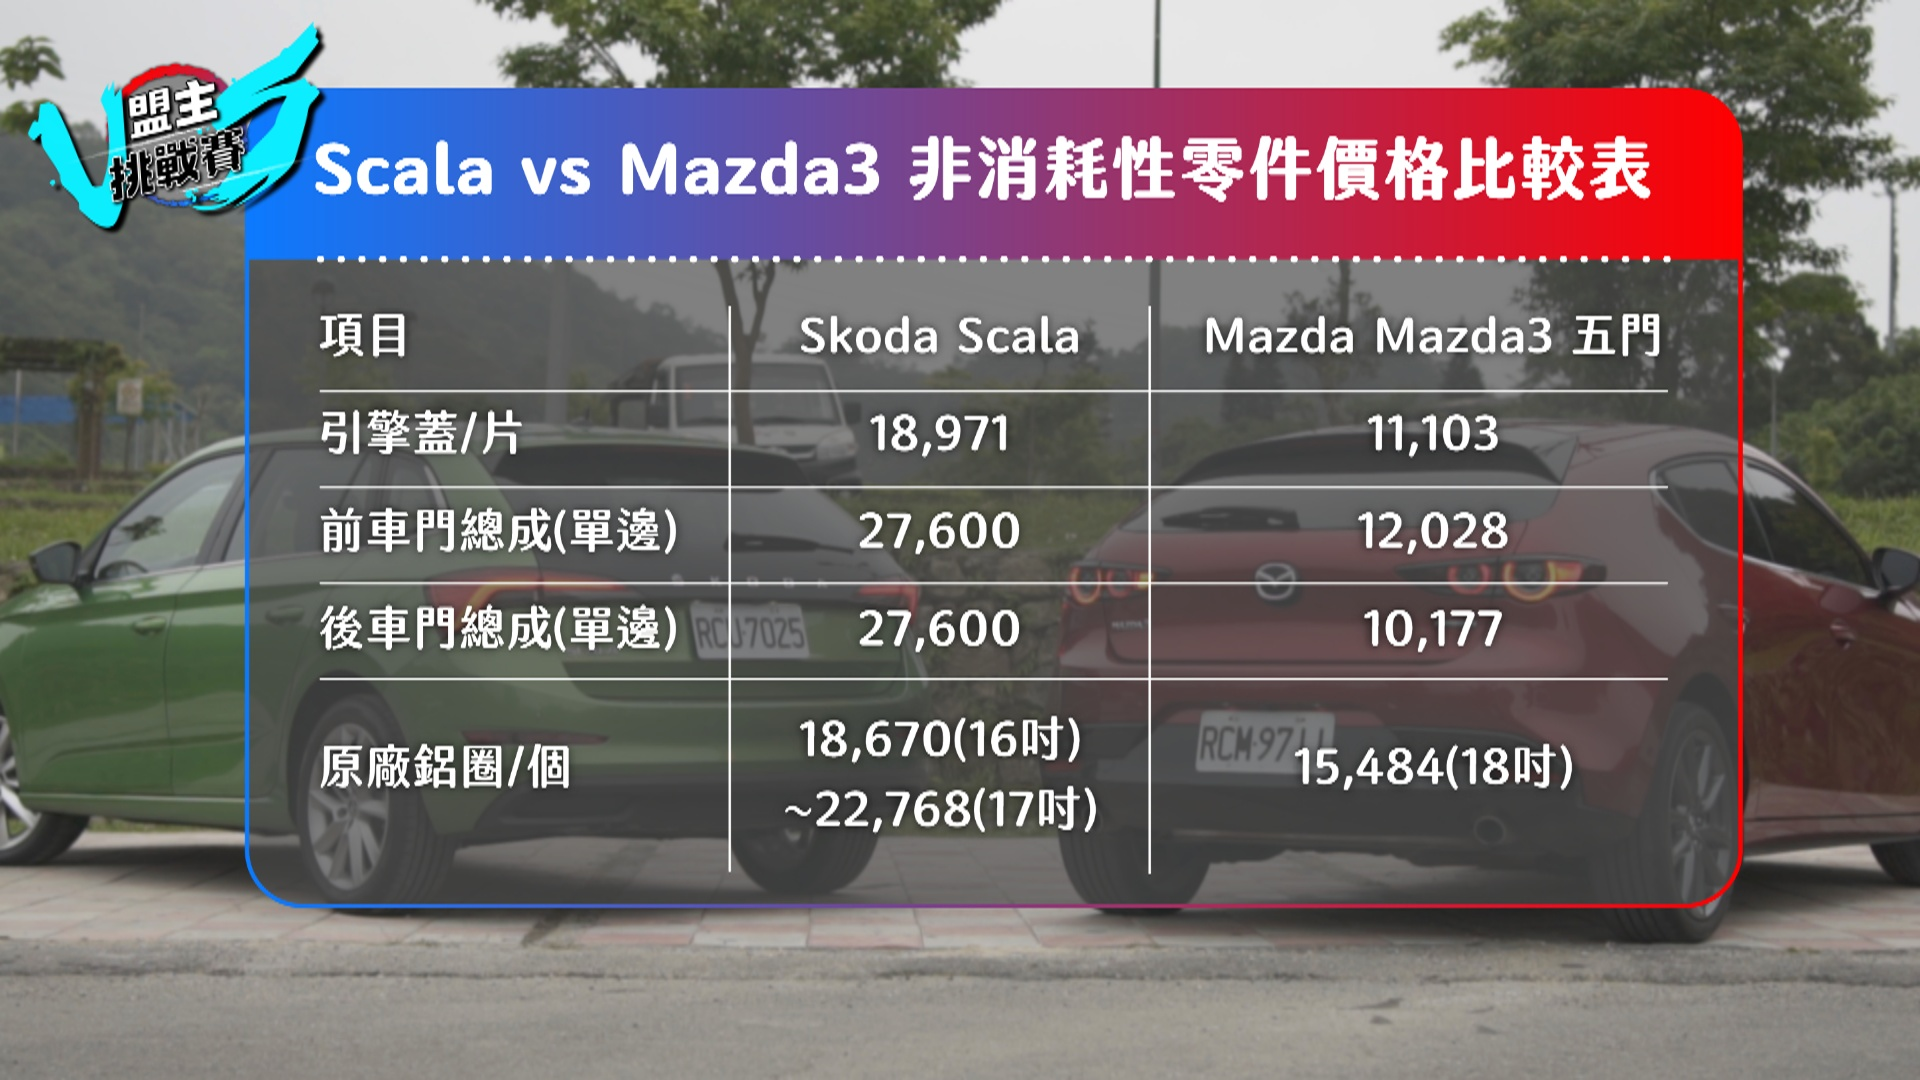 Mazda3 的鋁圈 18 吋竟然還比 Scala 的 16 或 17 吋還來得便宜。